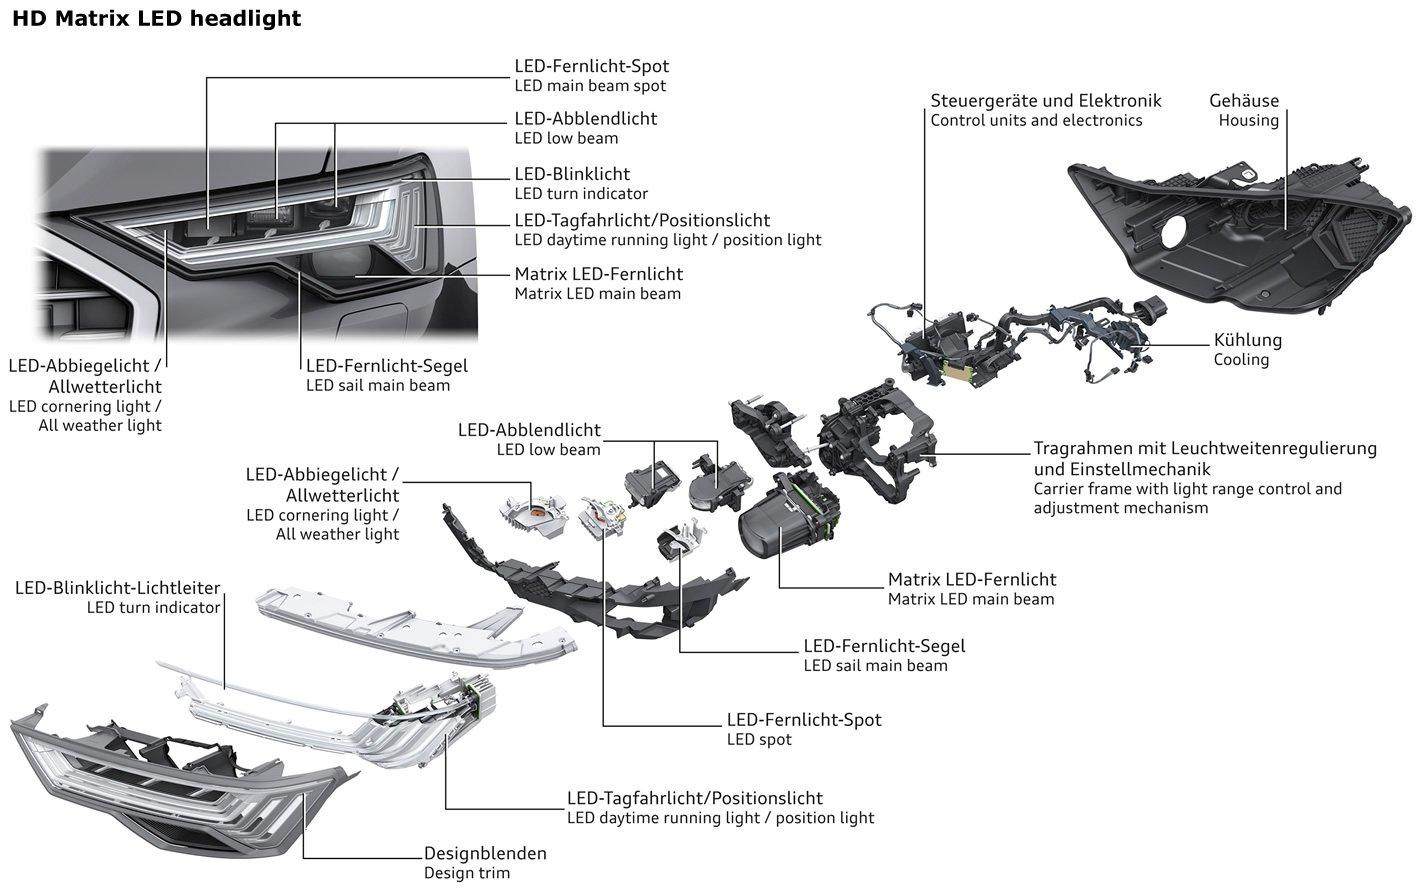 Audi A6 - budowa HD Matrix LED